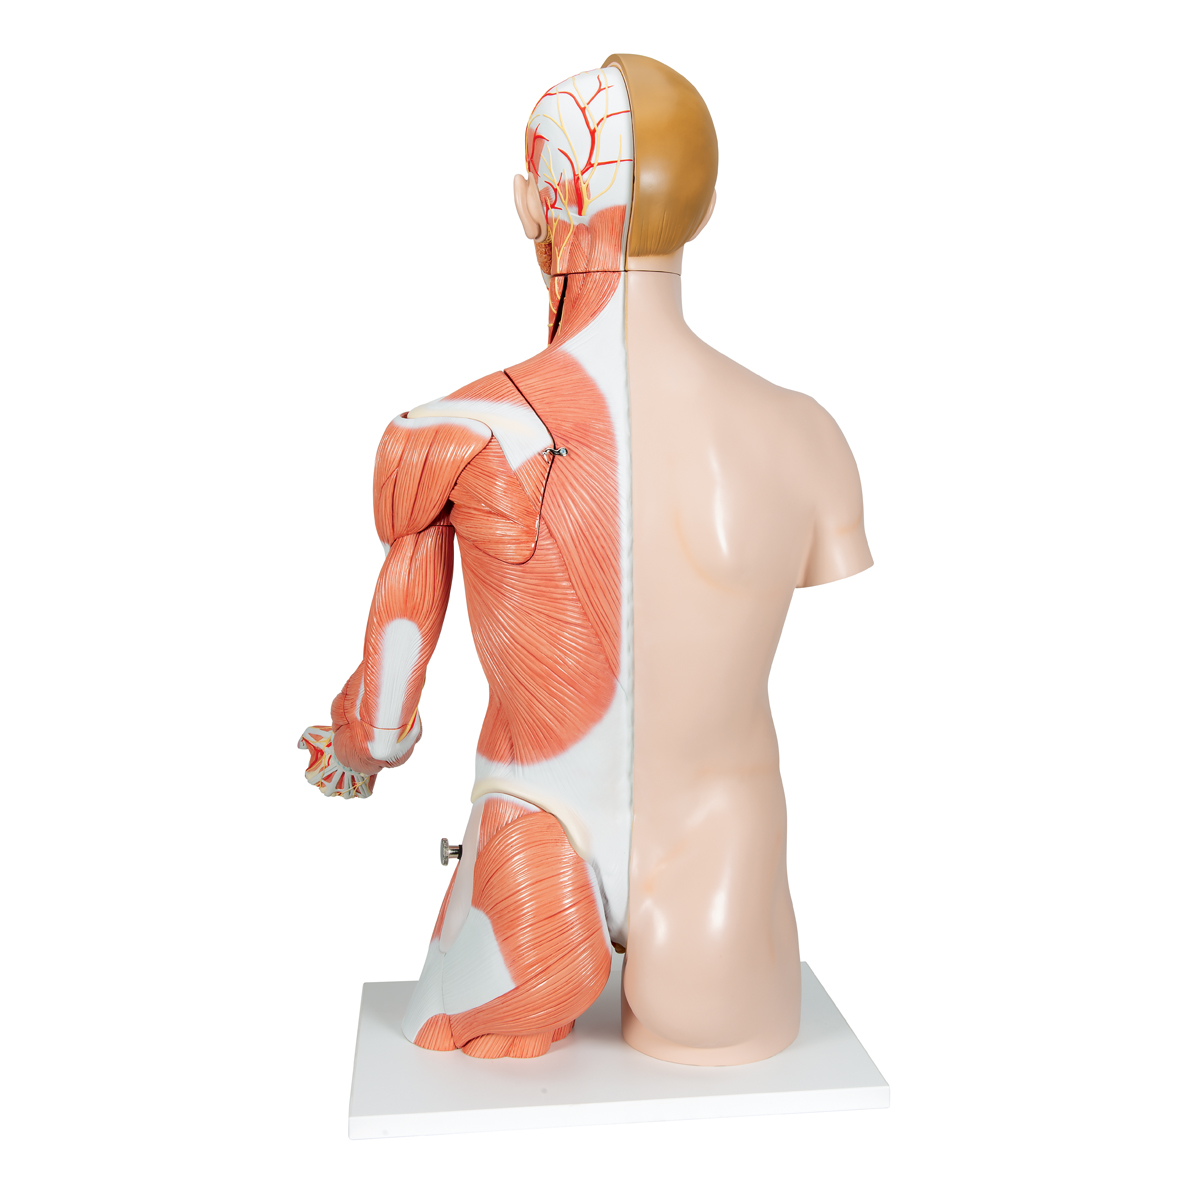 Human Torso Model - Life-Size Torso Model - Anatomical Teaching ...